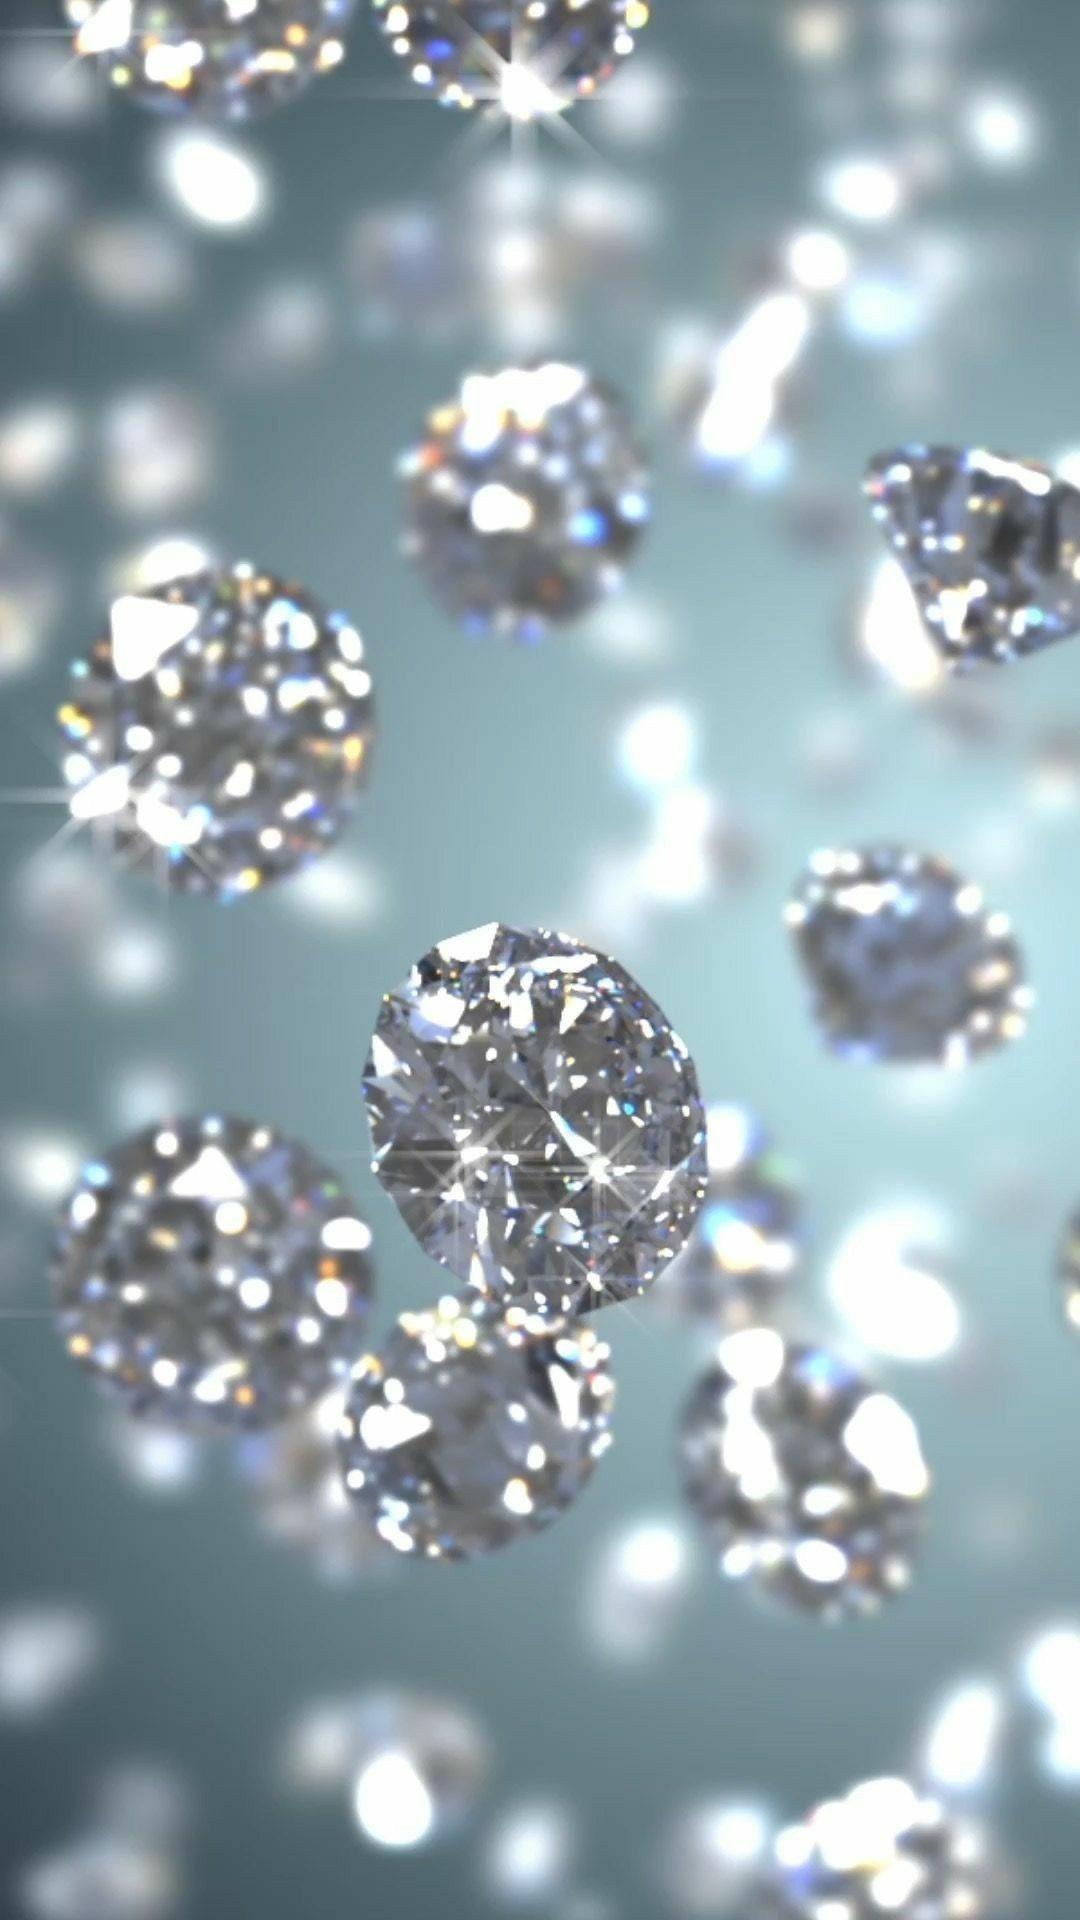 Diamond Iphone Background Design Wallpapers Ideas в 2020